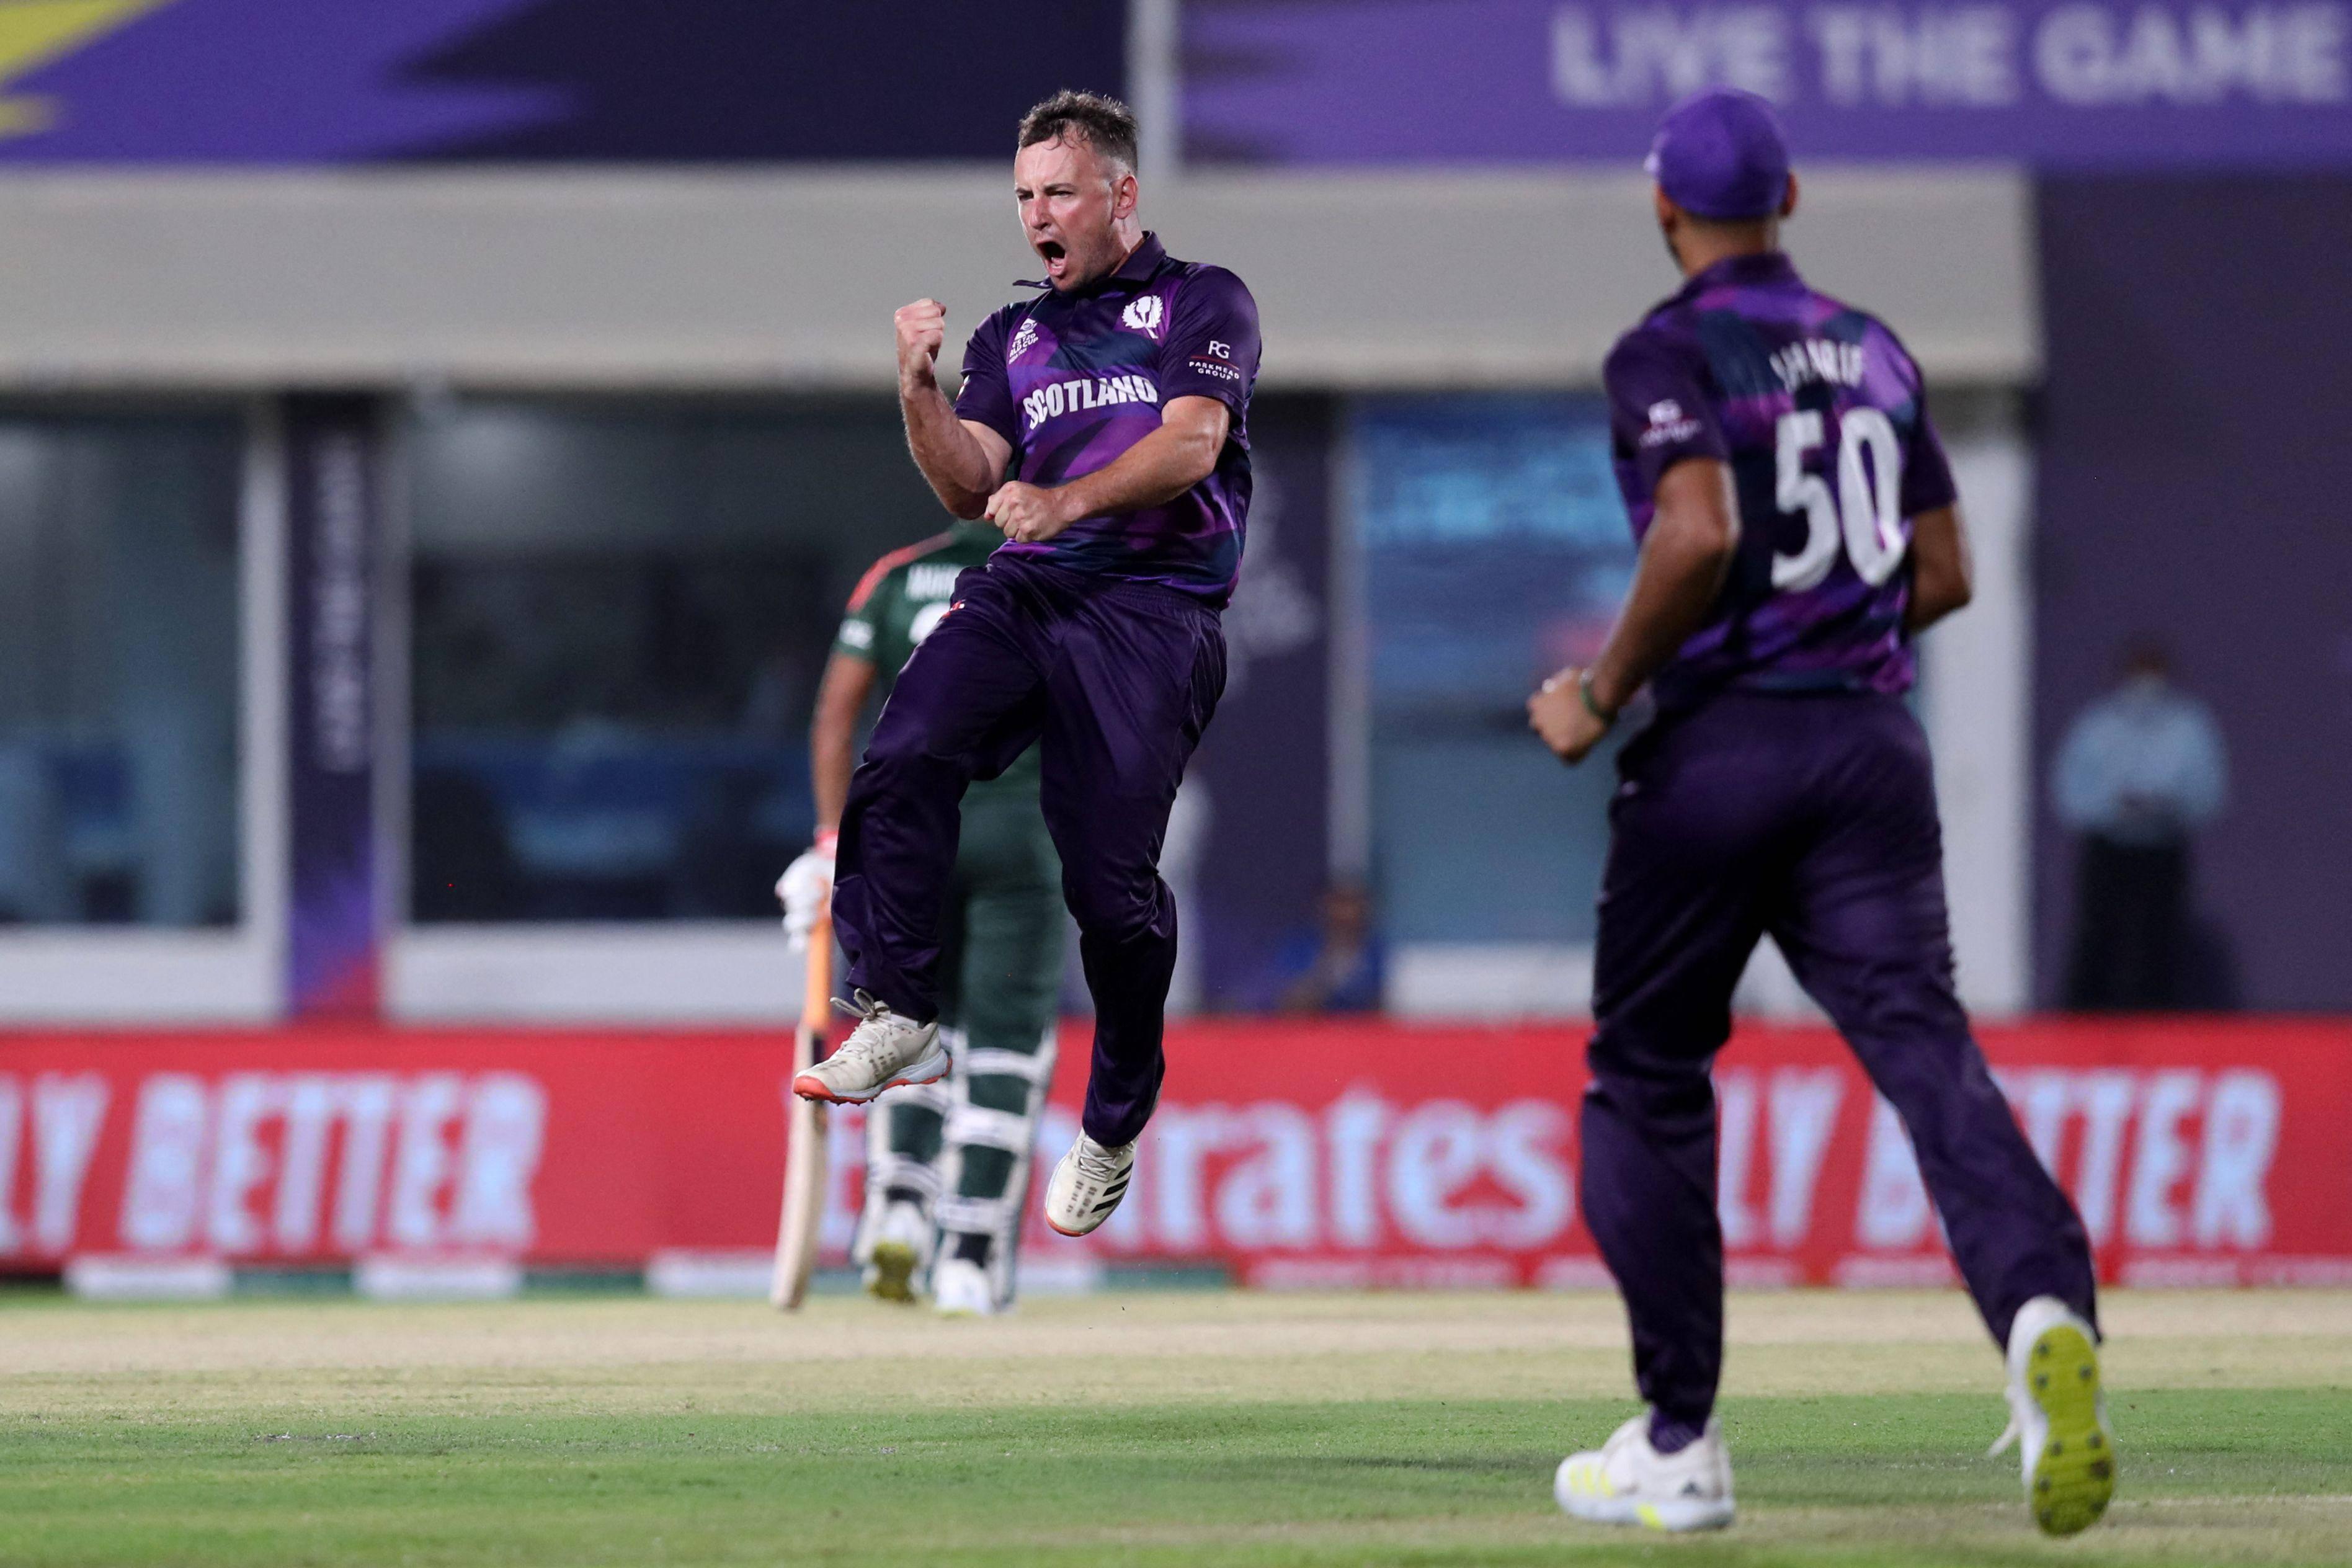 T20 World Cup: Scotland shock Bangladesh with six-run win